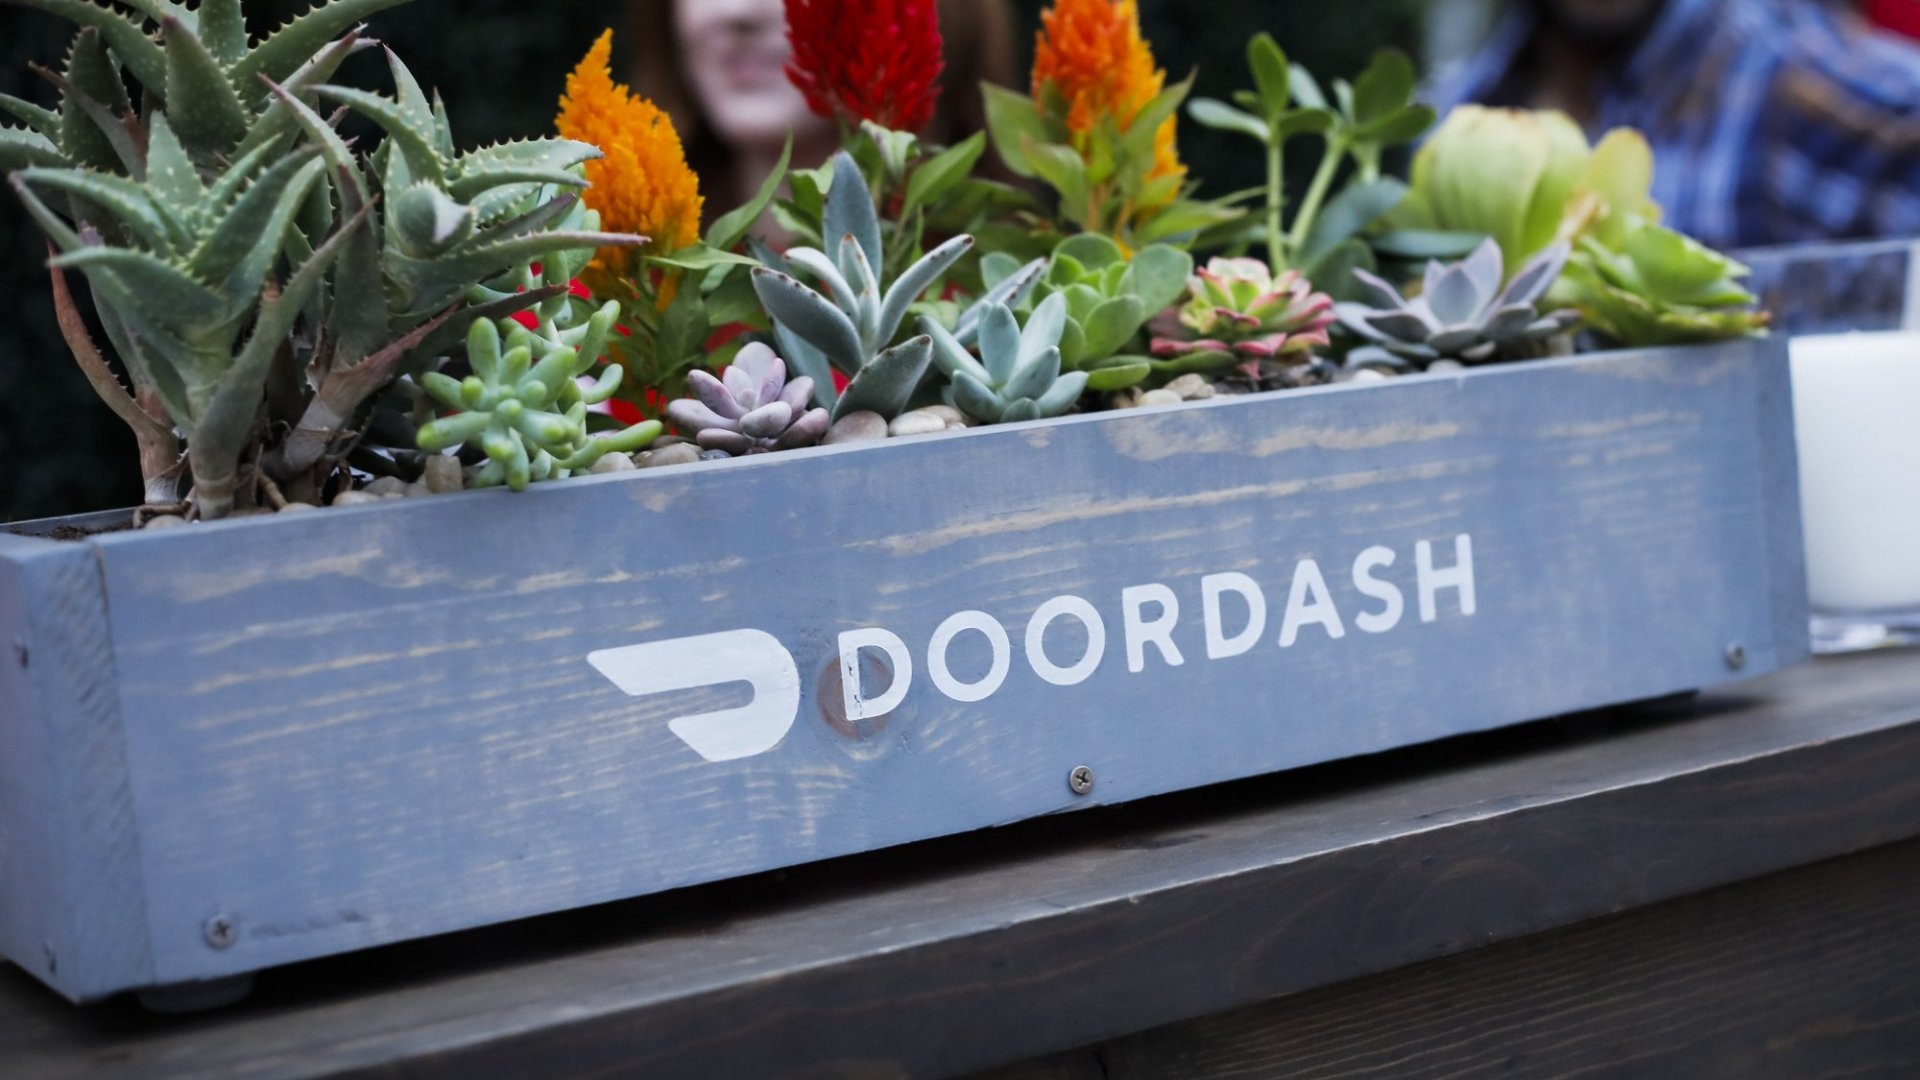 DoorDash Has Confidentially Filed IPO Paperwork as the Company Prepares to Go Public